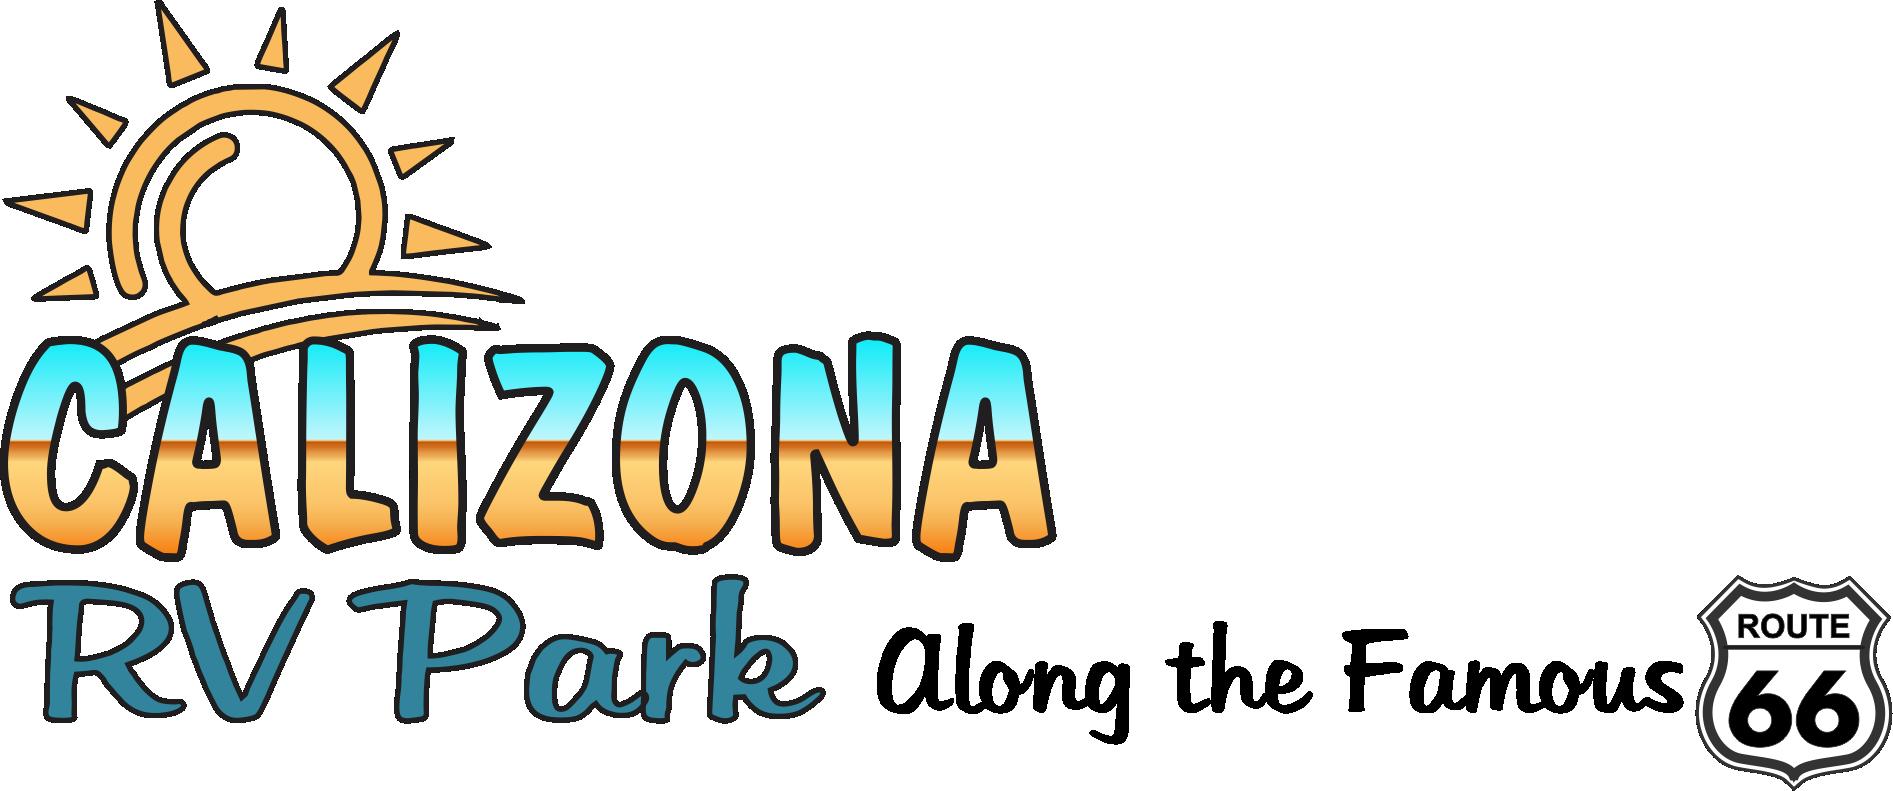 Calizona RV Park logo